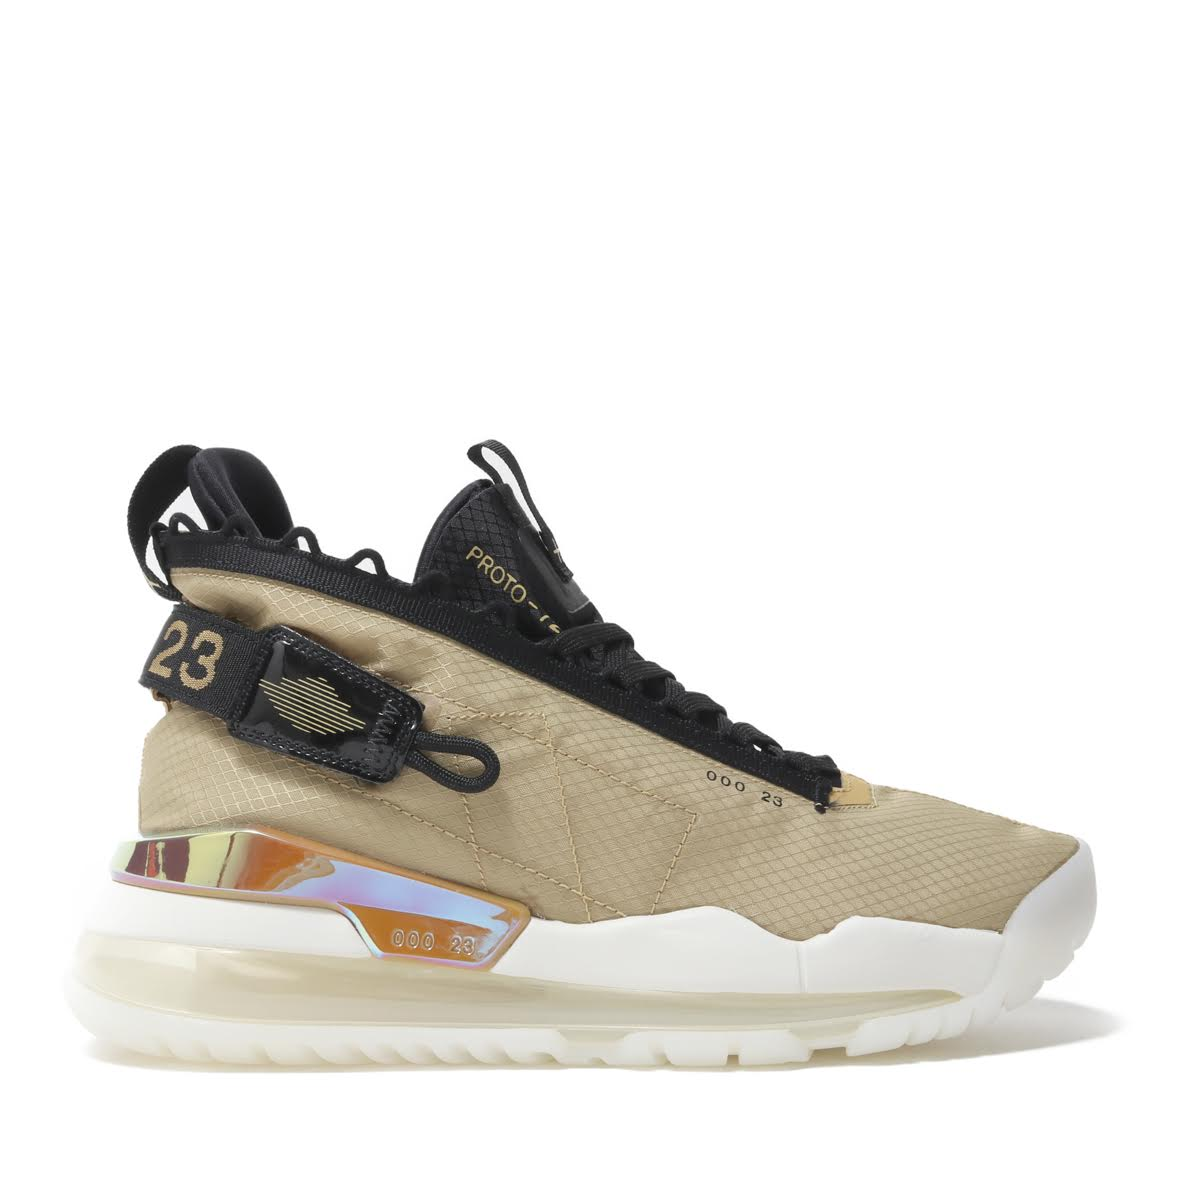 atmos Nike Jordan Proto Max 720